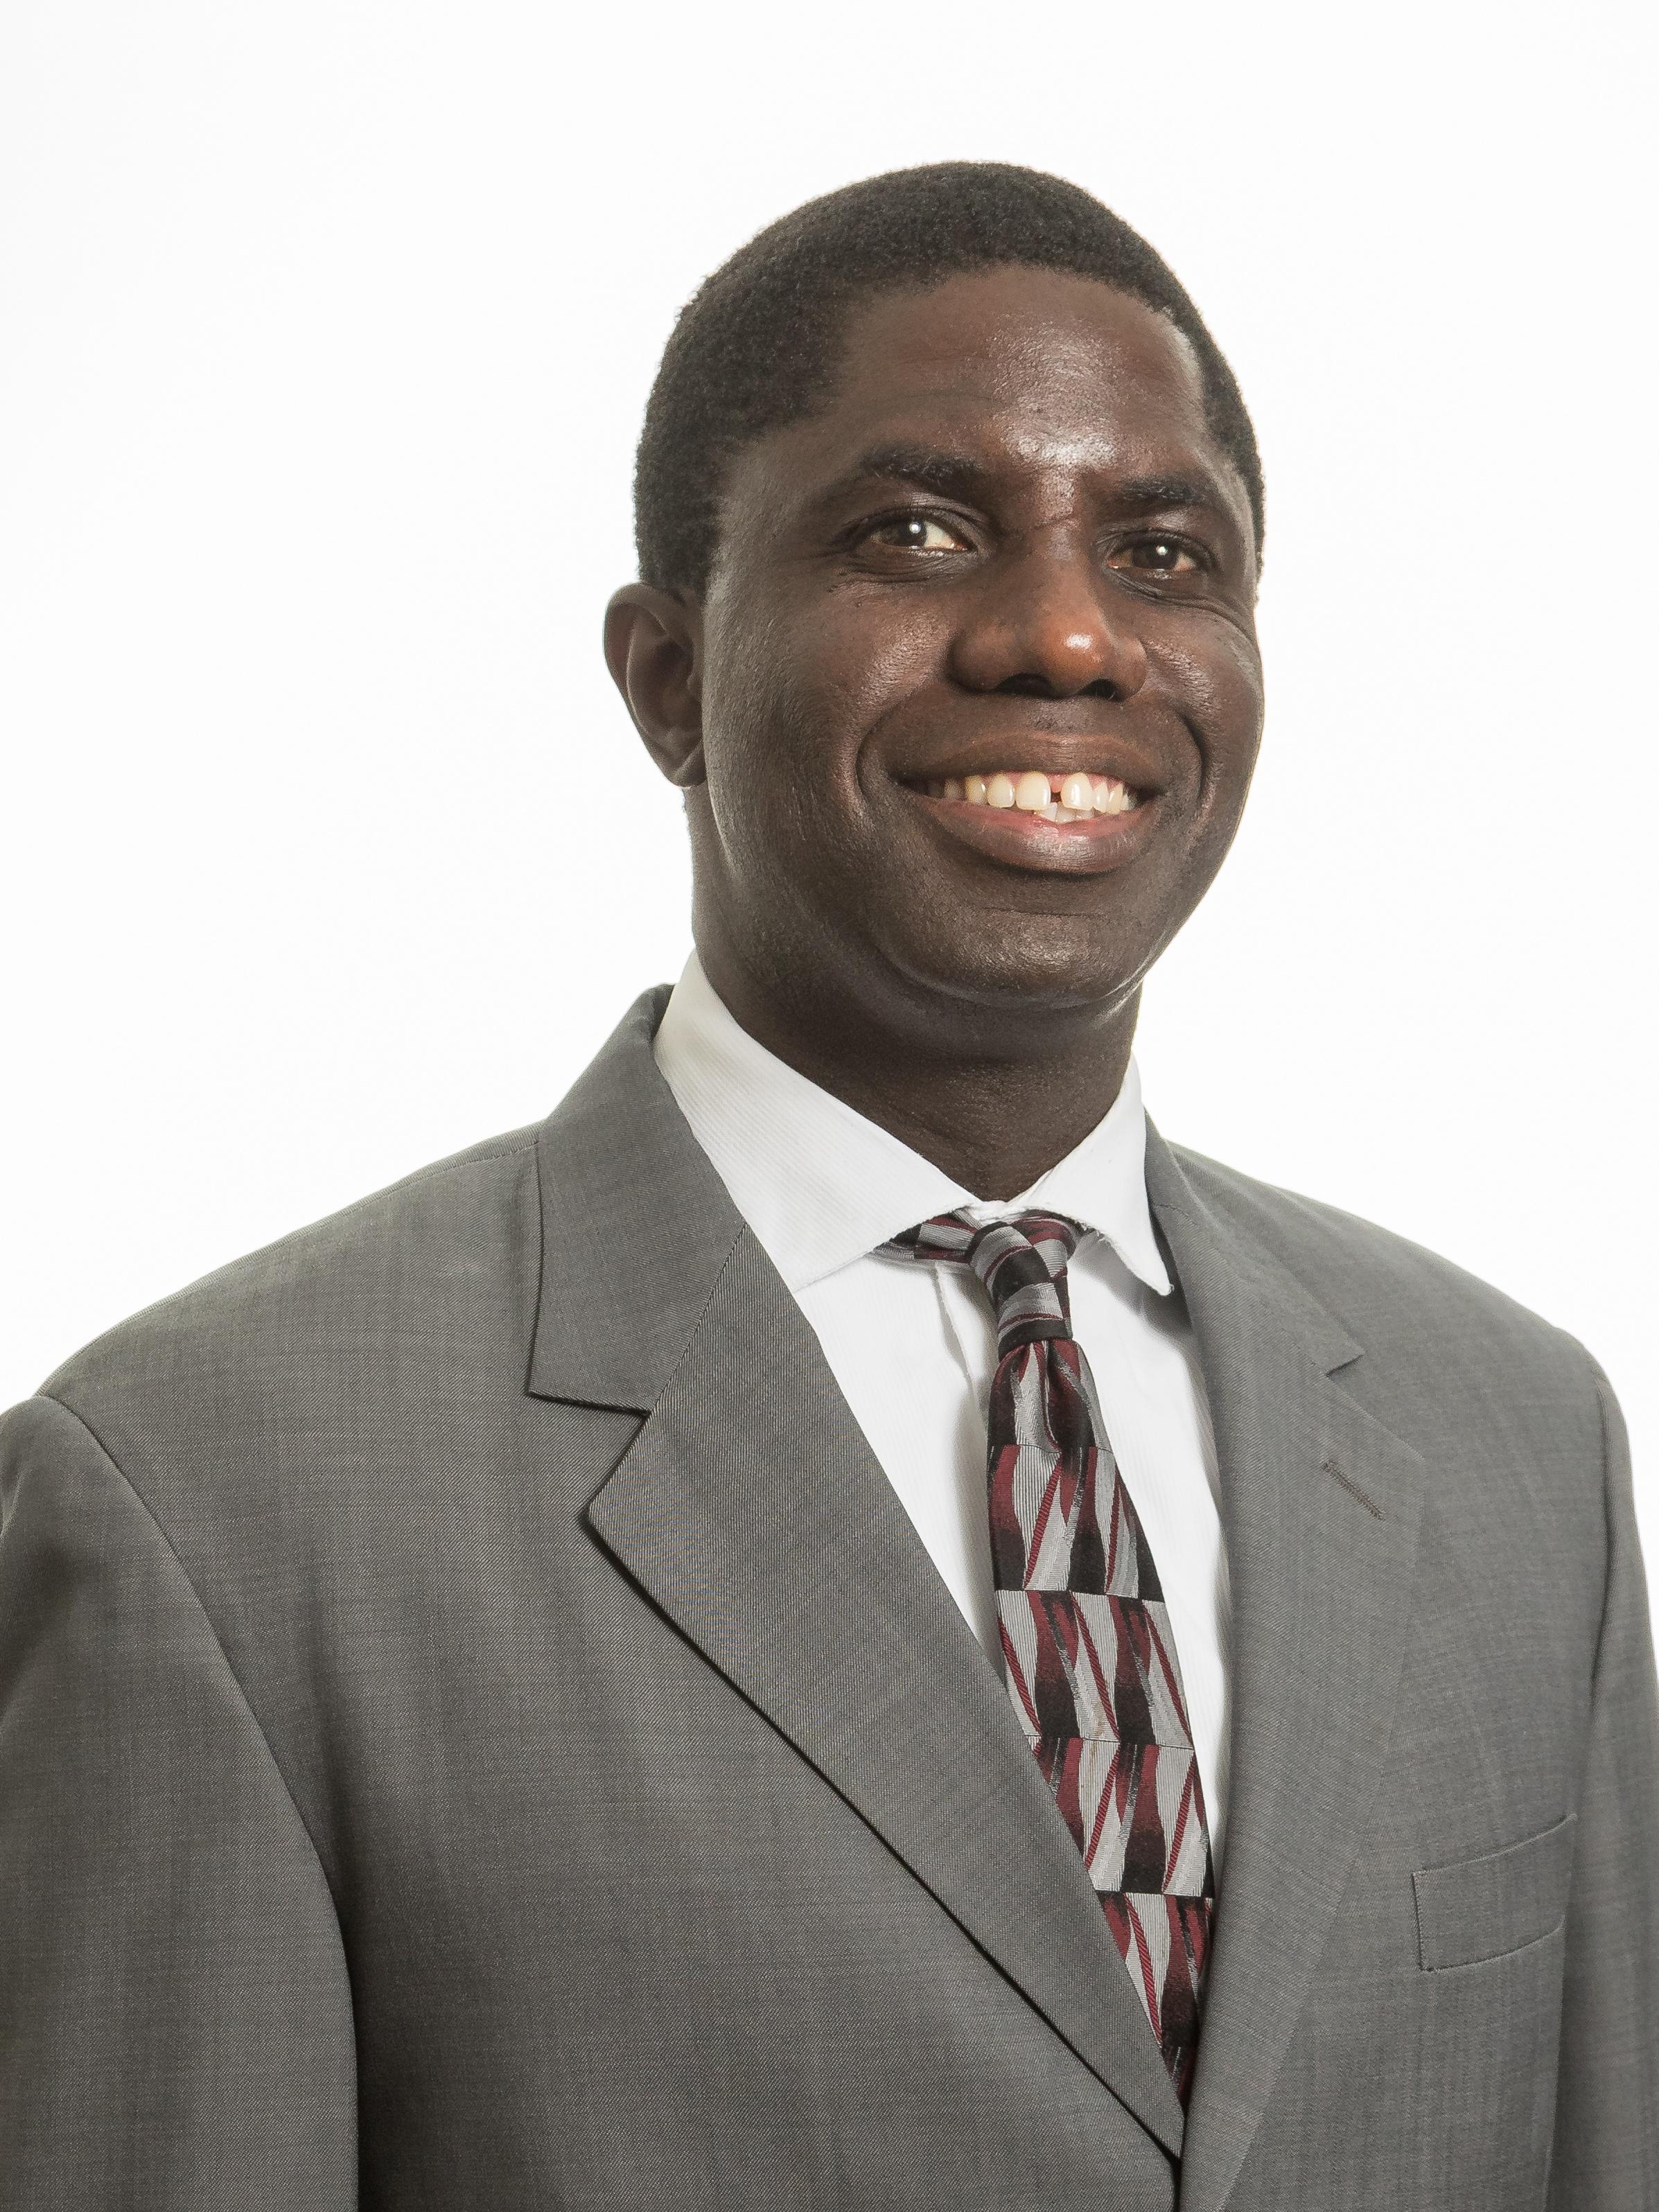 Employee Spotlight: Kwabena Adu-Sarkodie, P.E.